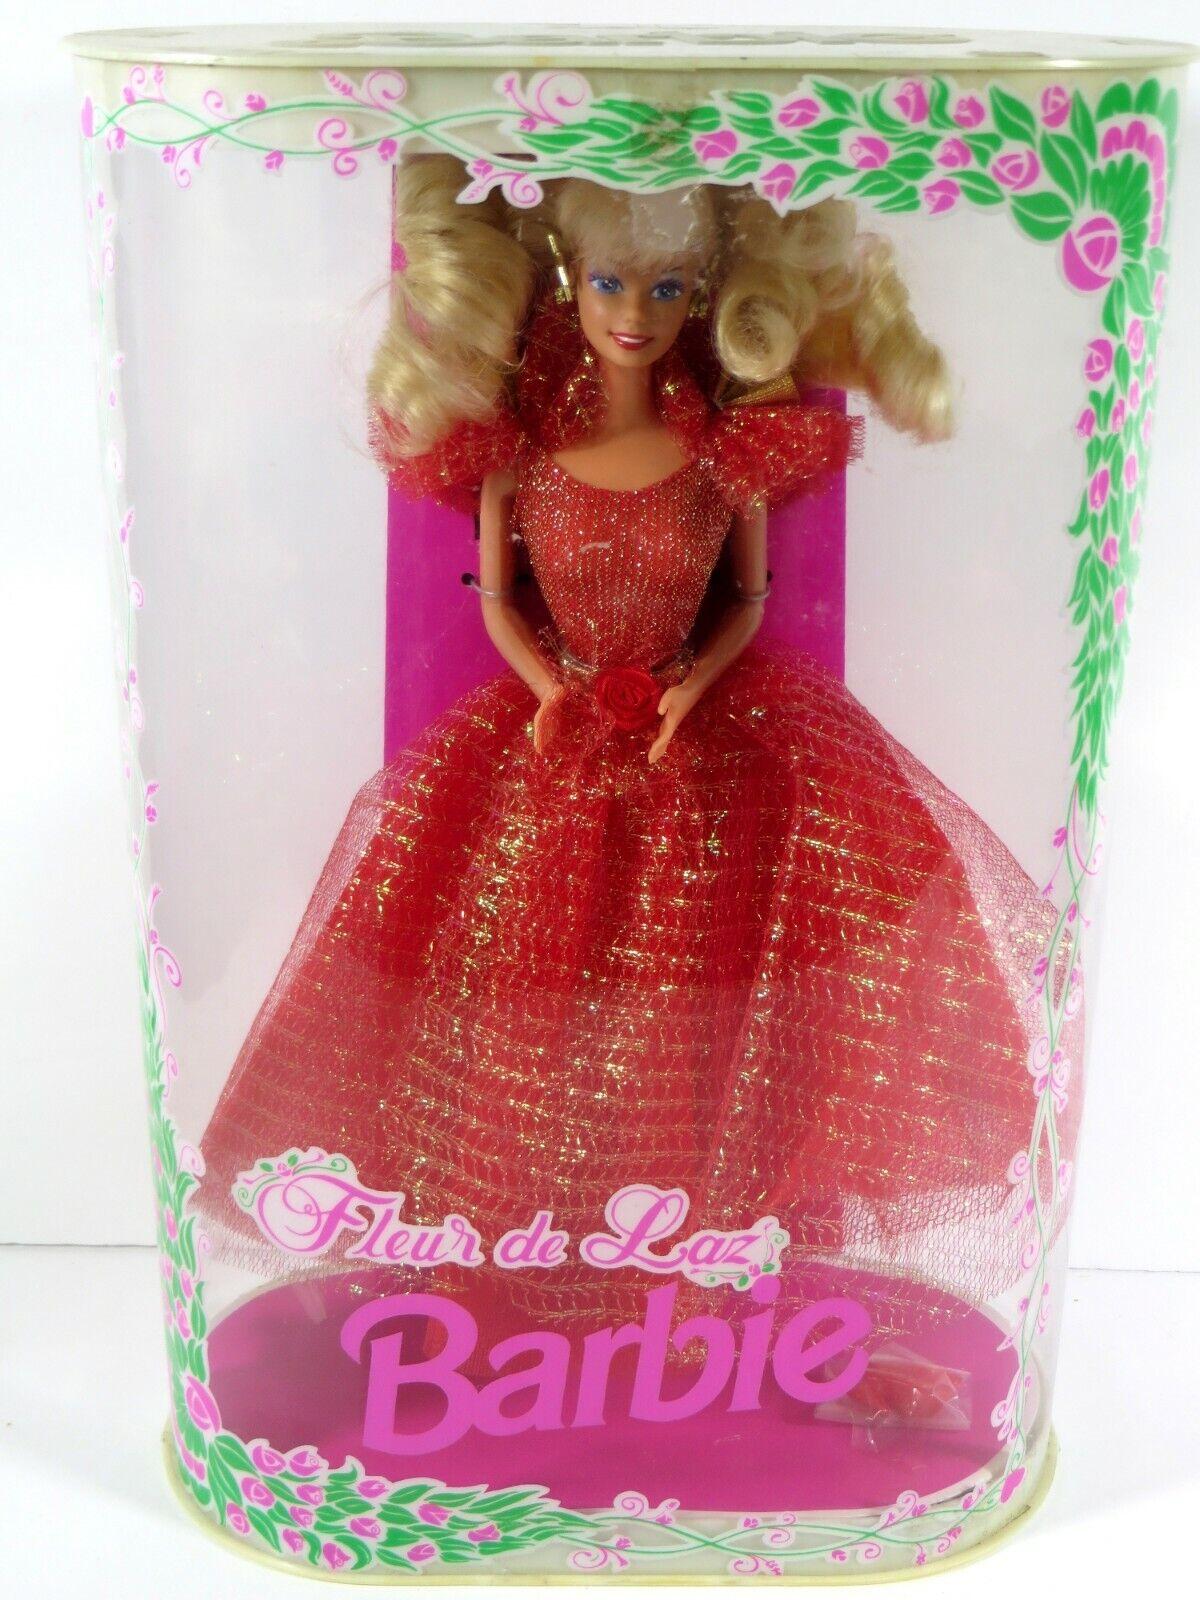 Nuevo en Caja Muñeca Barbie 1994 Filipinas Fleur De Laz mercado extranjero